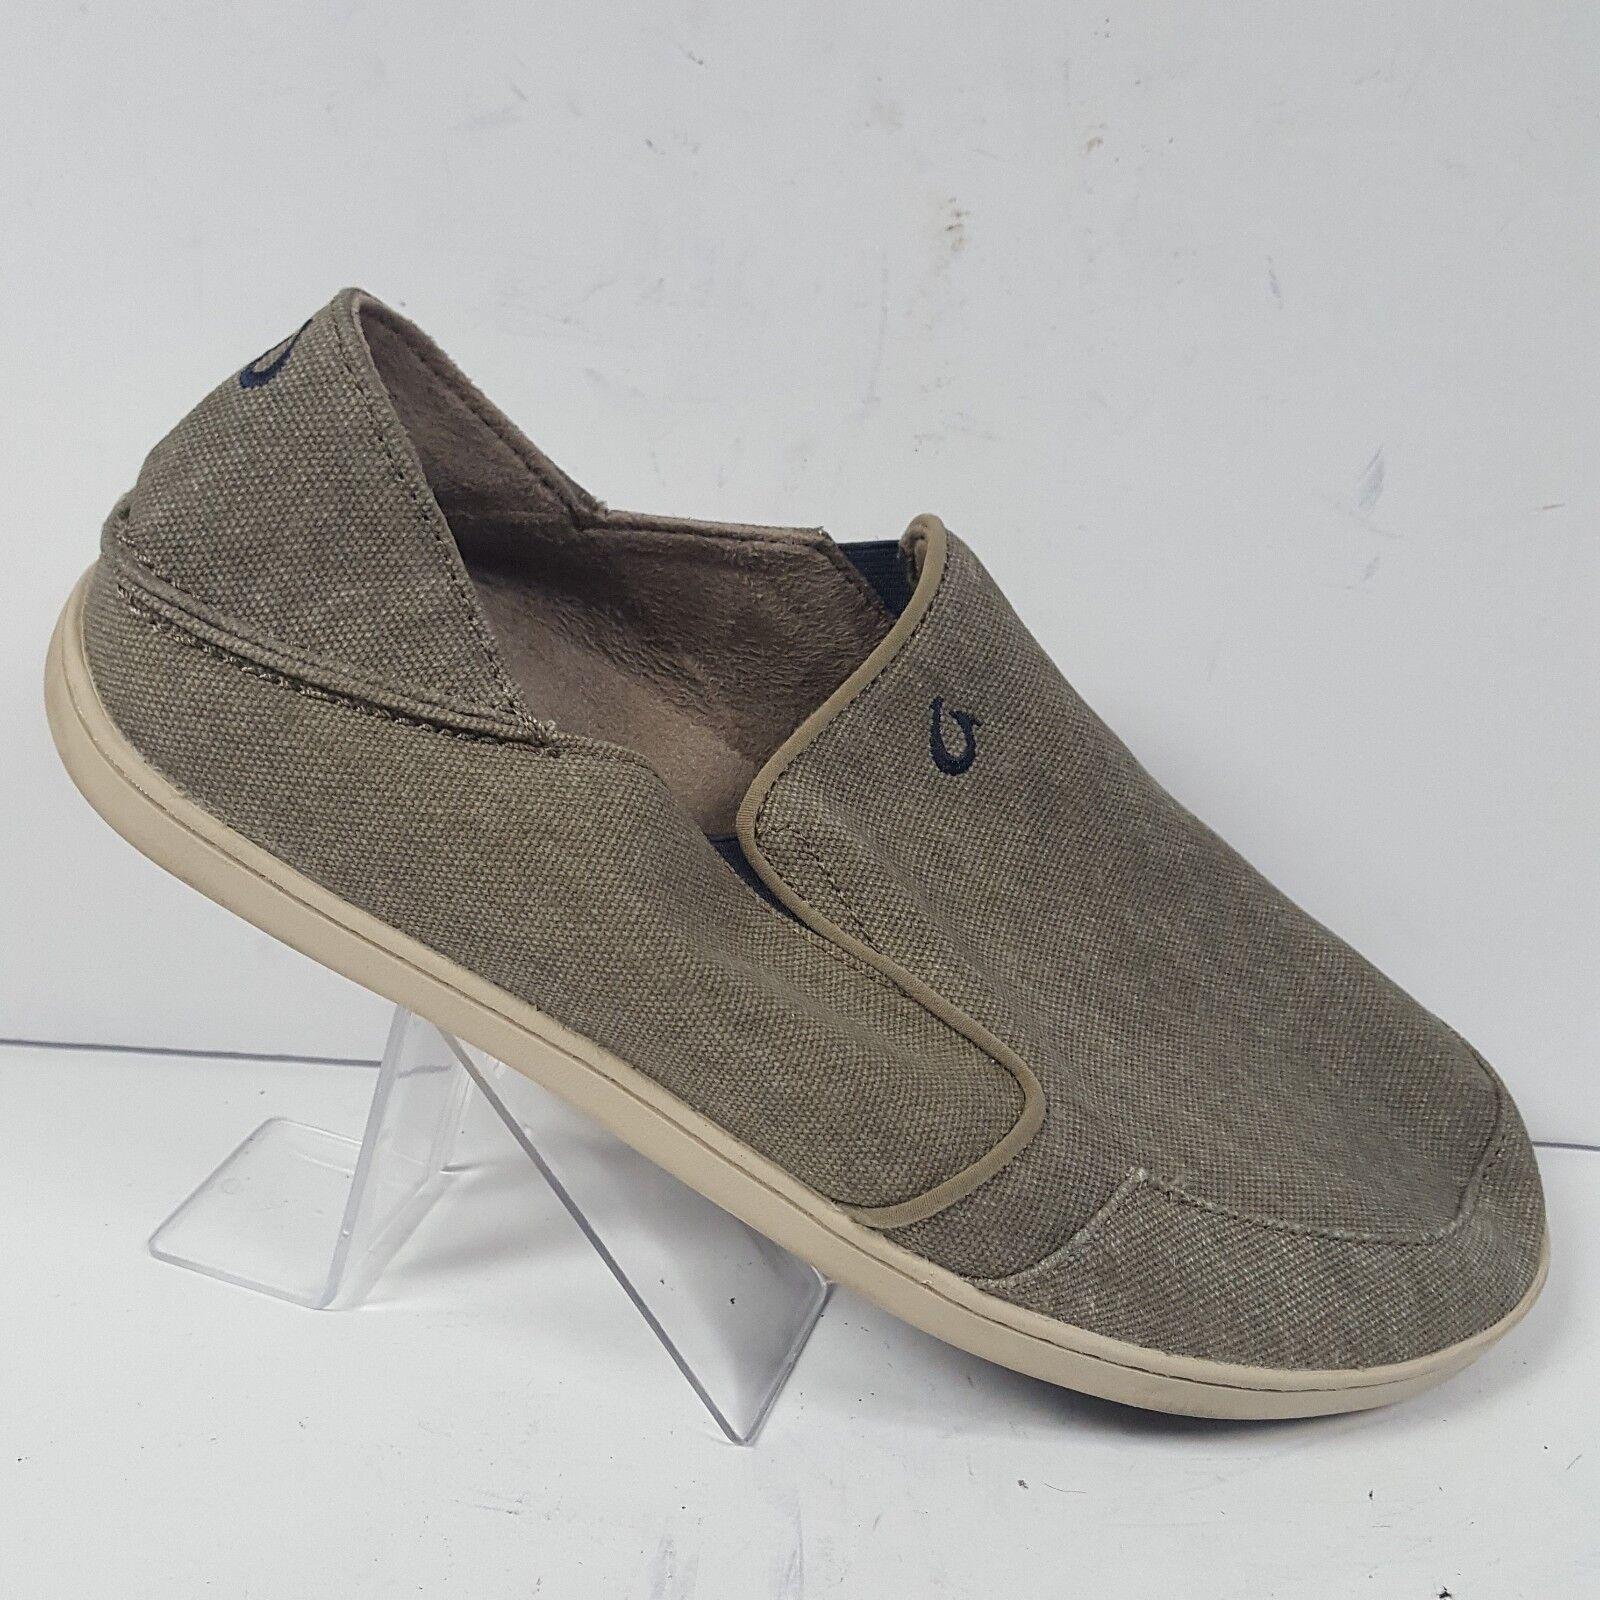 Olukai Nohea Lole Clay Trench Blue Slip On Shoes 10346-10DE Mens Size 10.5